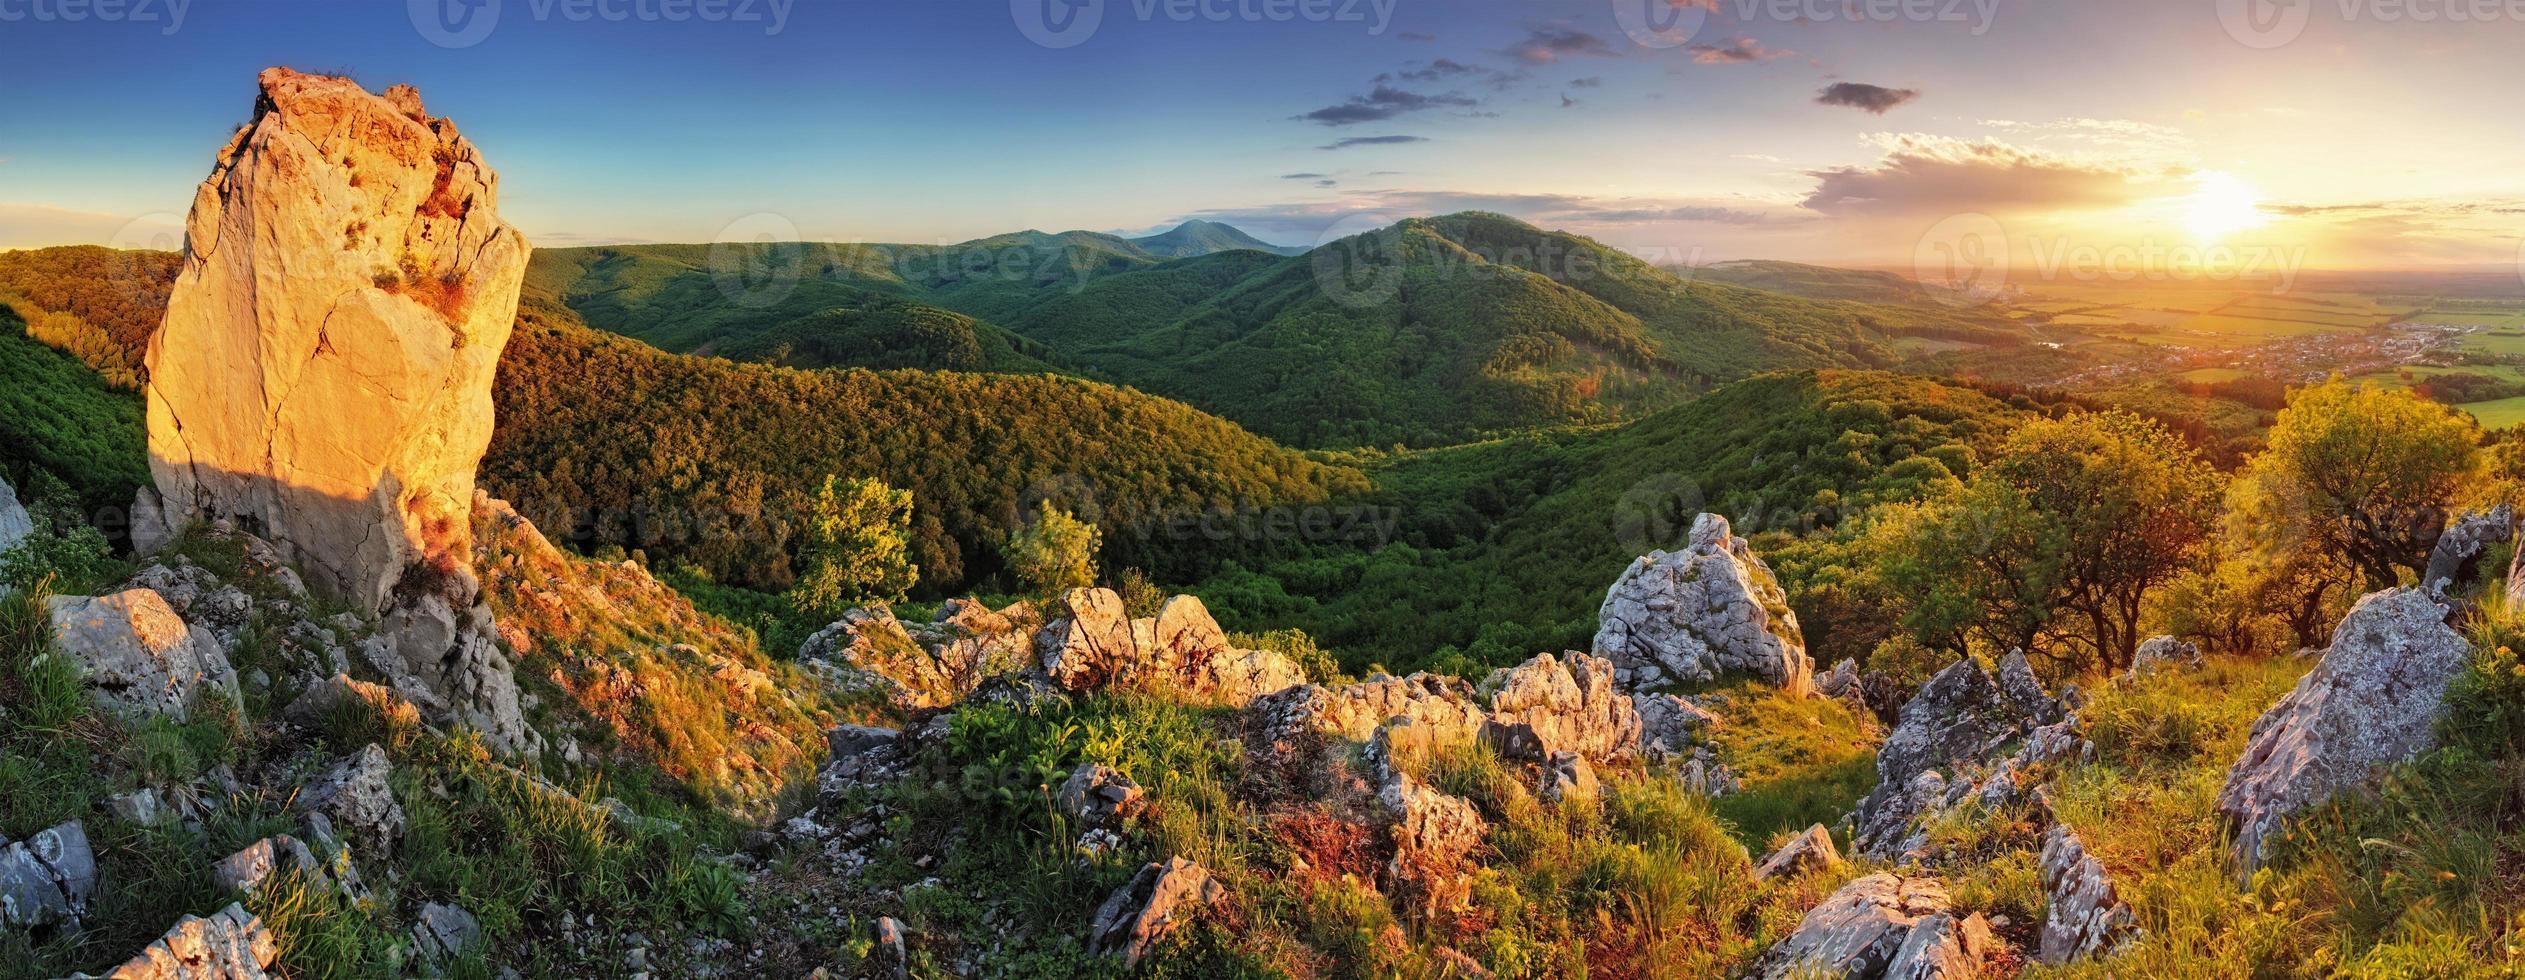 panorama da montanha foto